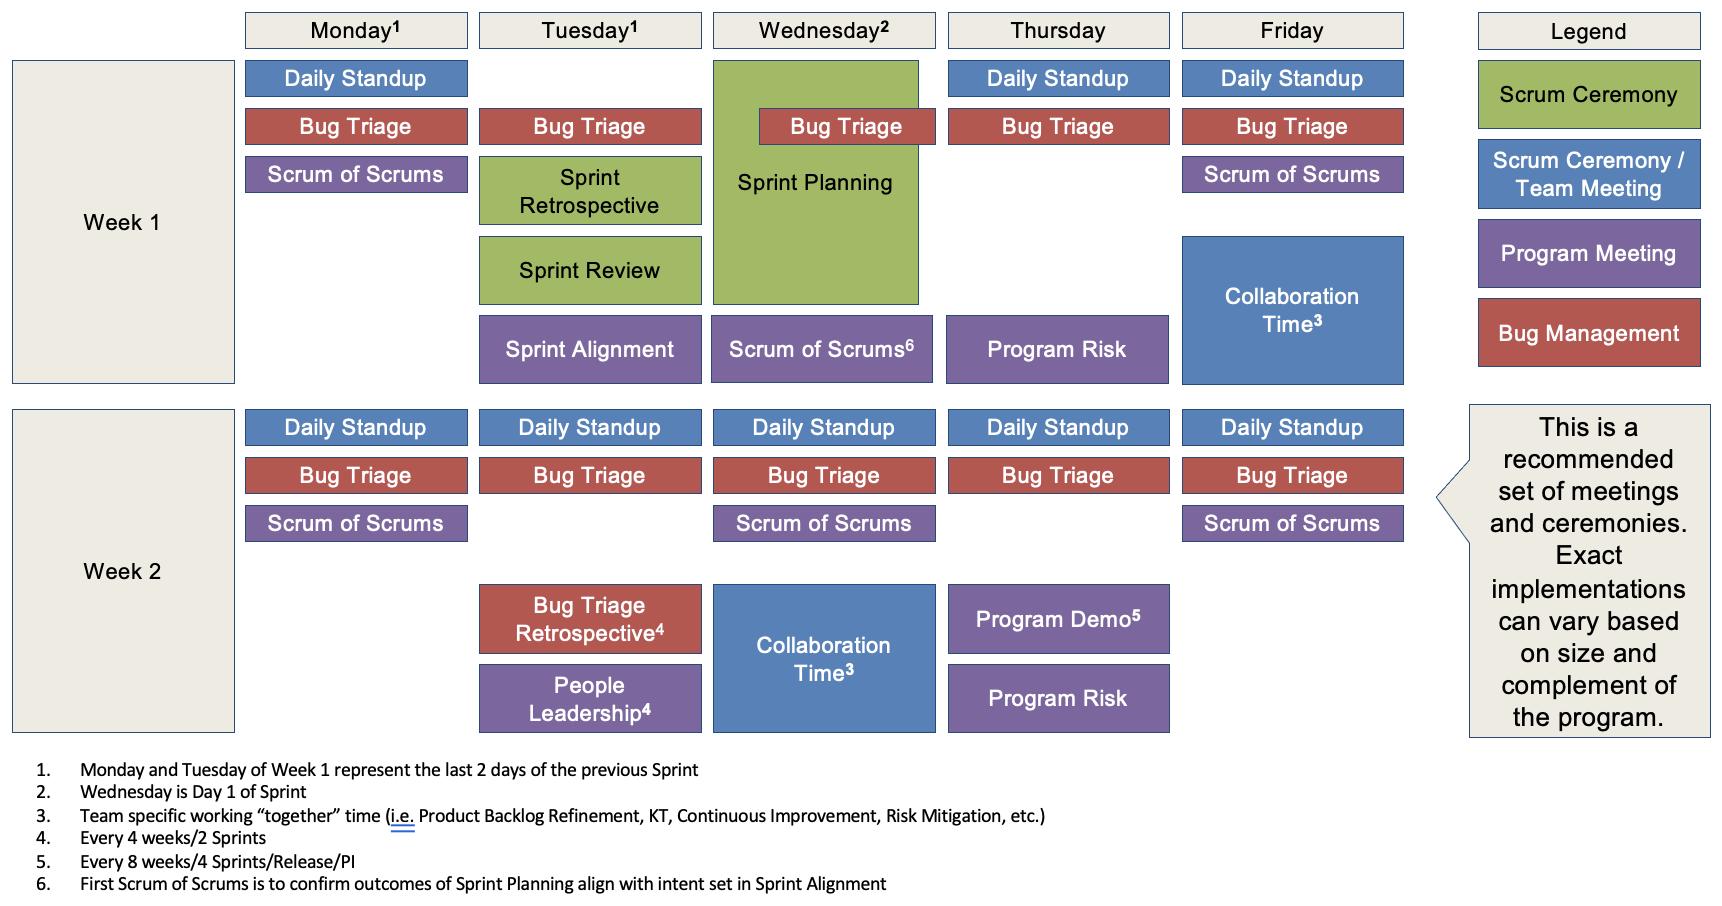 Agile Delivery Playbook - Program Ceremonies Meeting Schedule